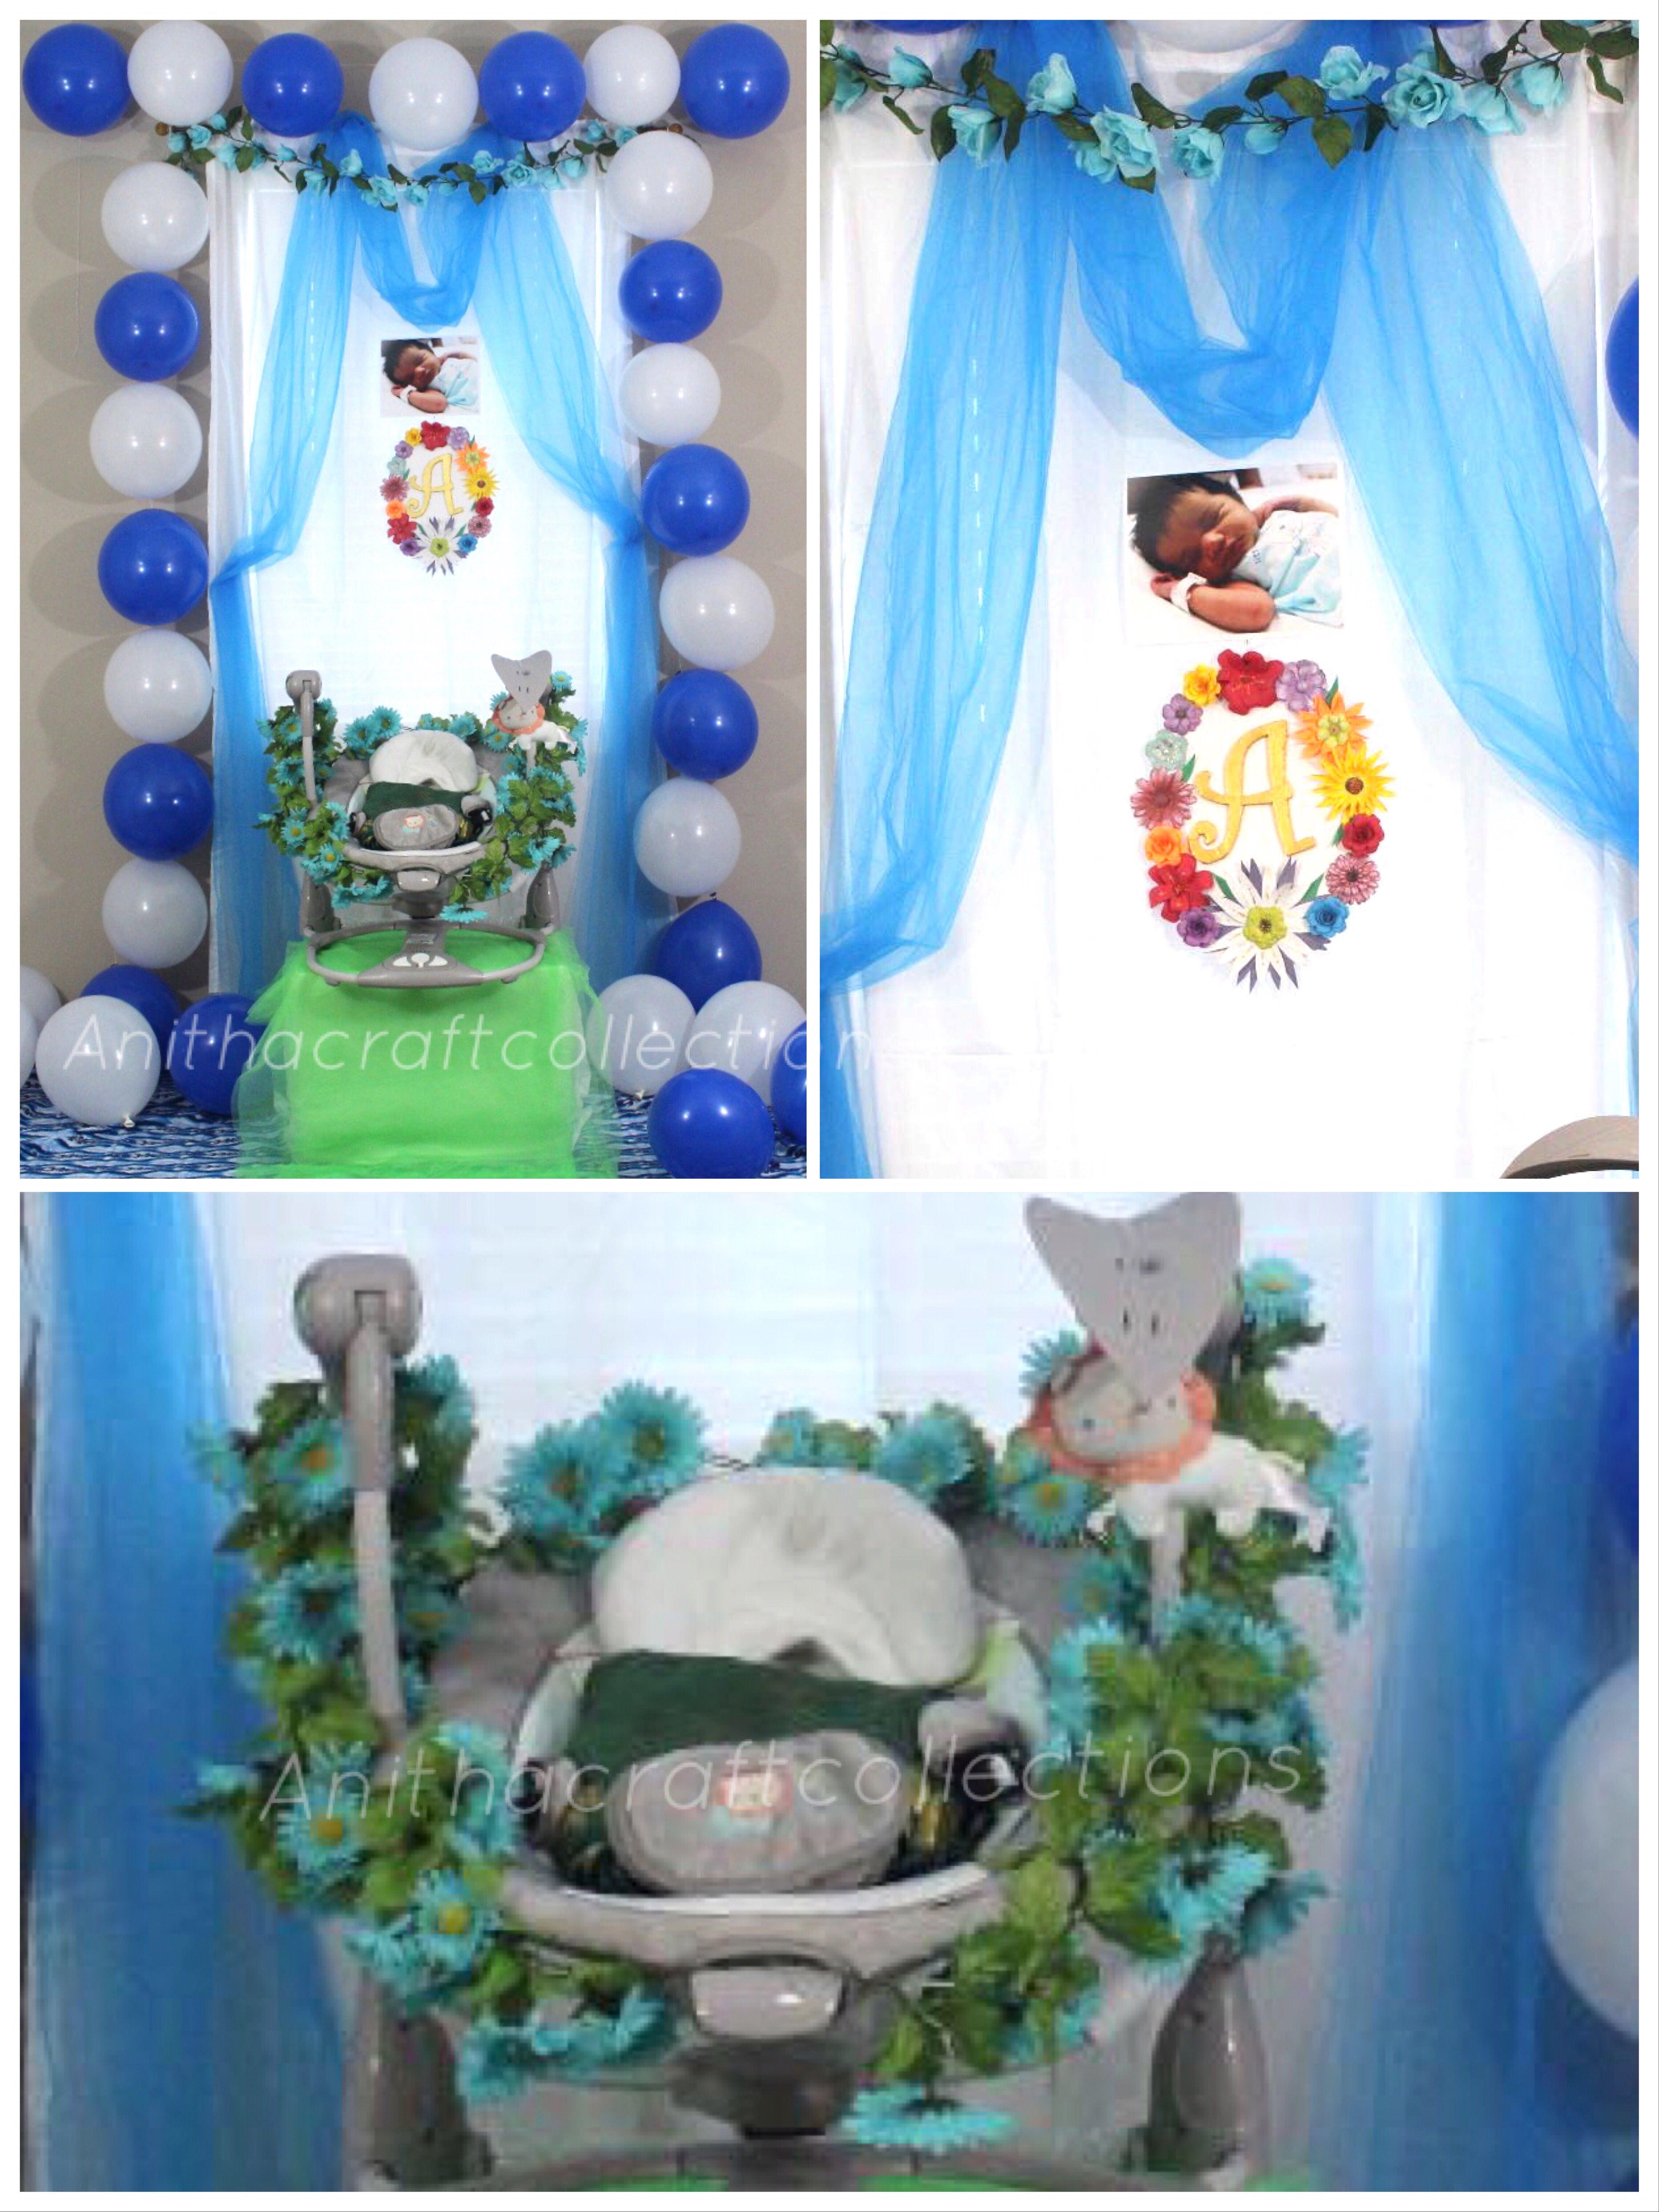 Simple Cradle Ceremony Decoration At